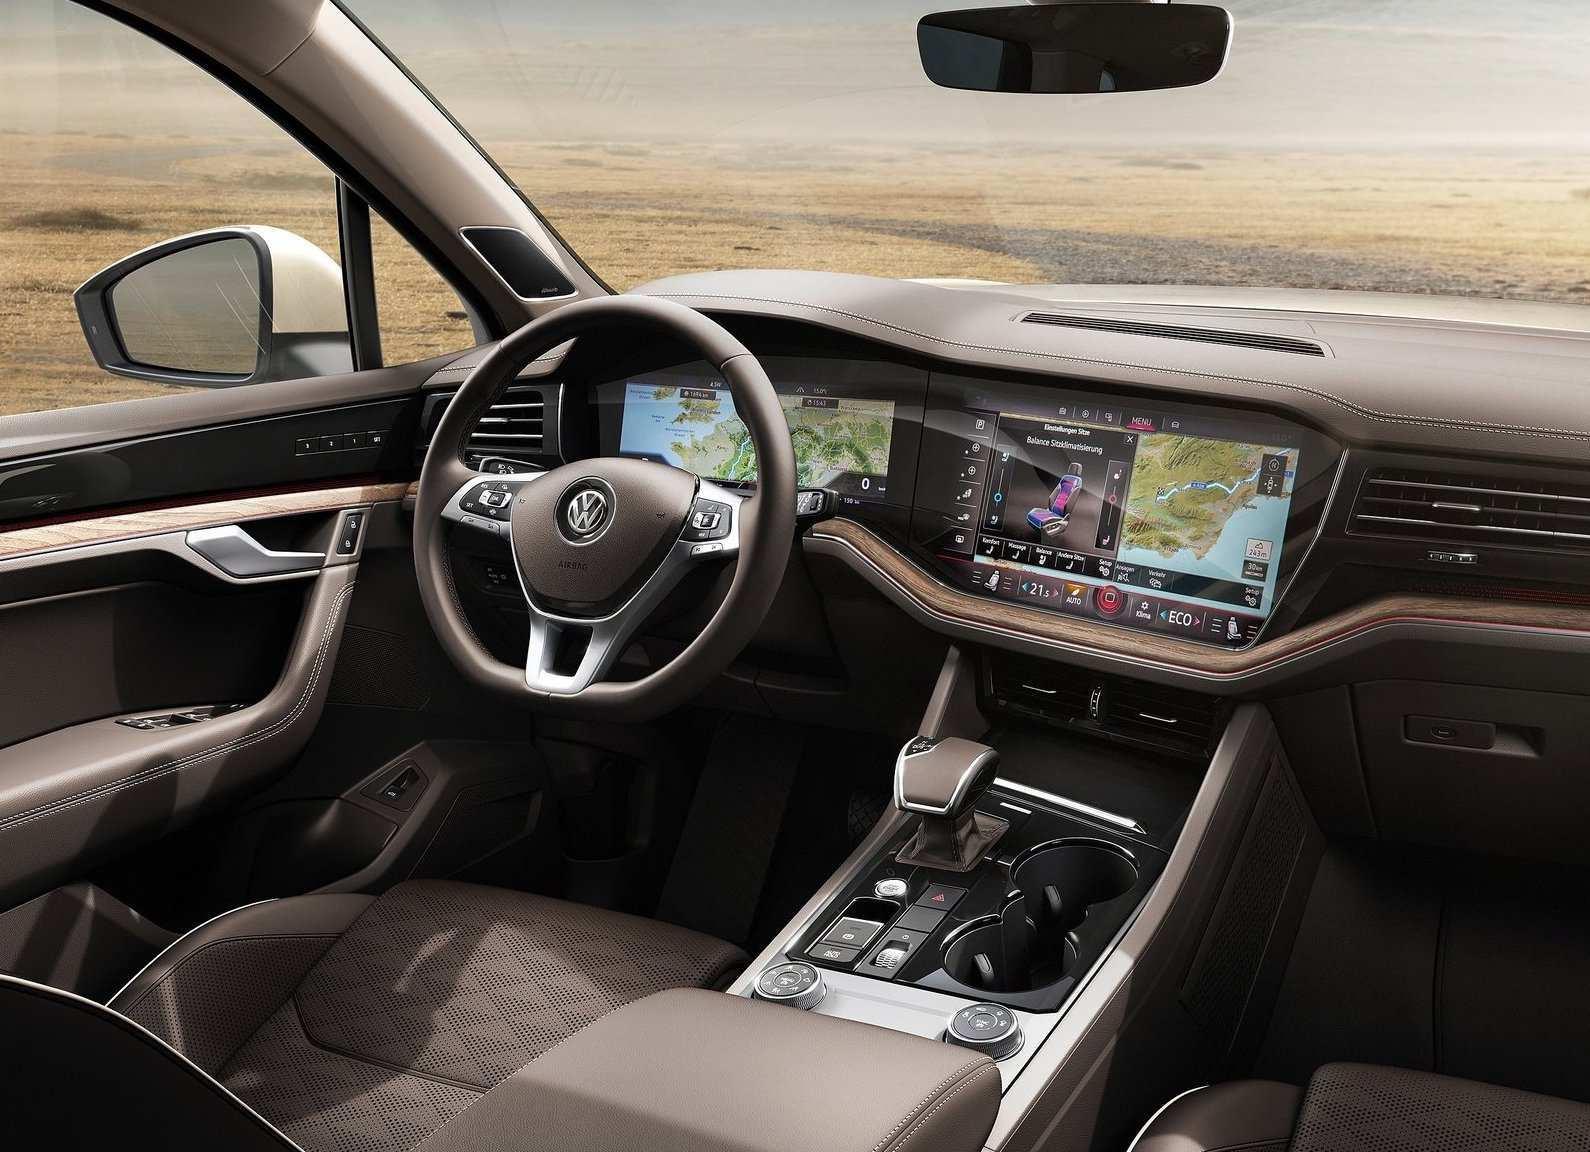 89 Gallery of The Volkswagen Diesel 2019 Picture Concept with The Volkswagen Diesel 2019 Picture